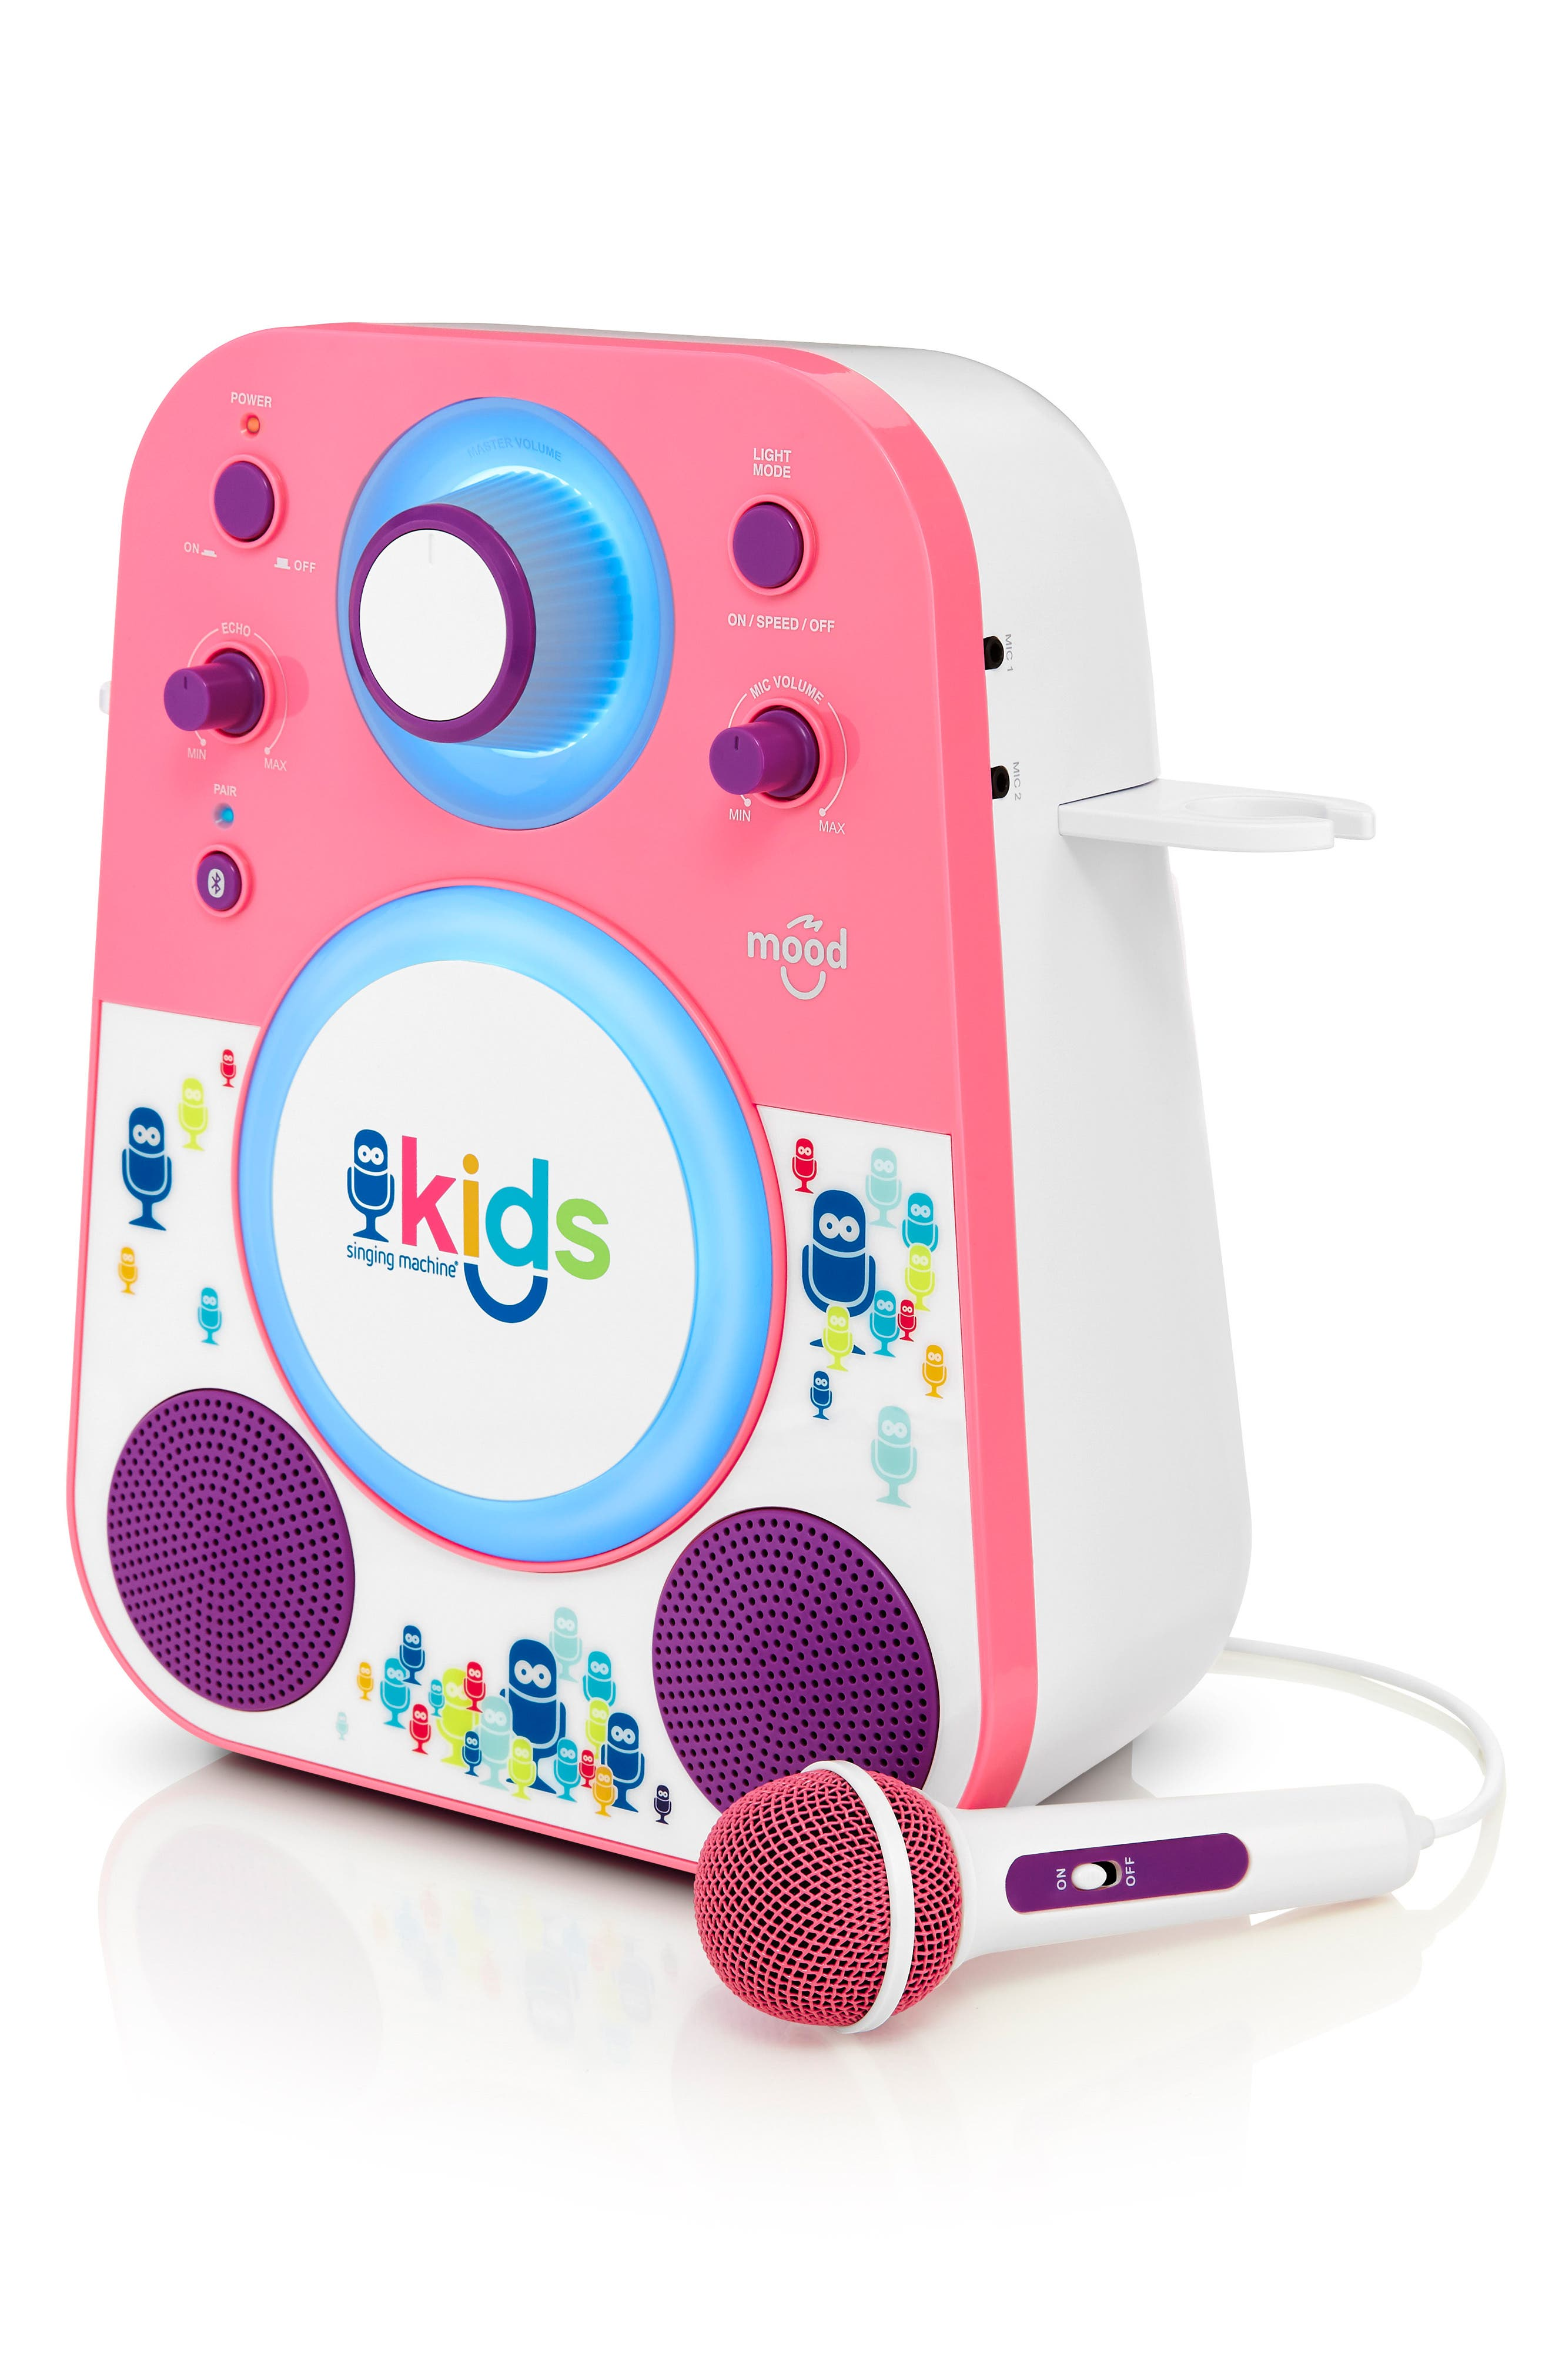 Kids Mood Karaoke System,                             Alternate thumbnail 8, color,                             PINK PURPLE